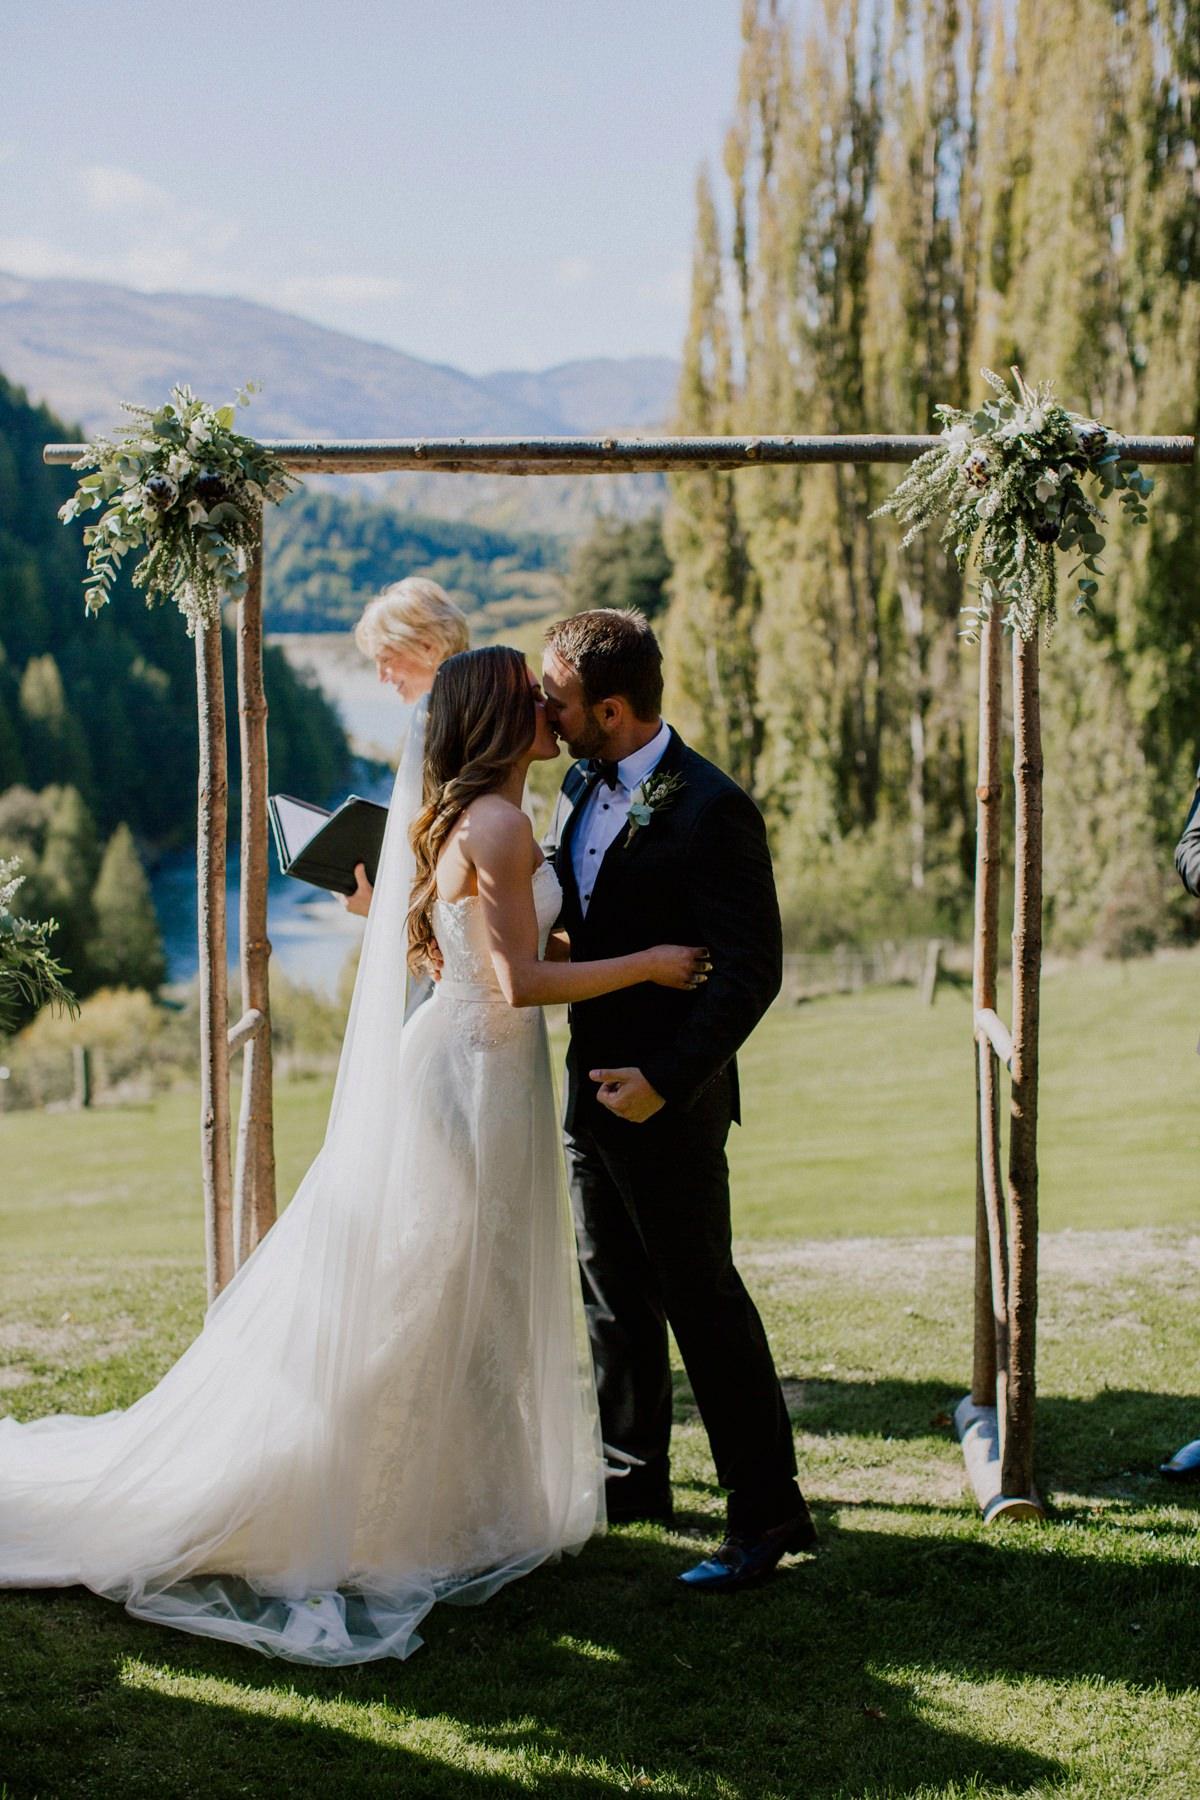 Alinta-Paul-New-Zealand-Destination-Wedding-84